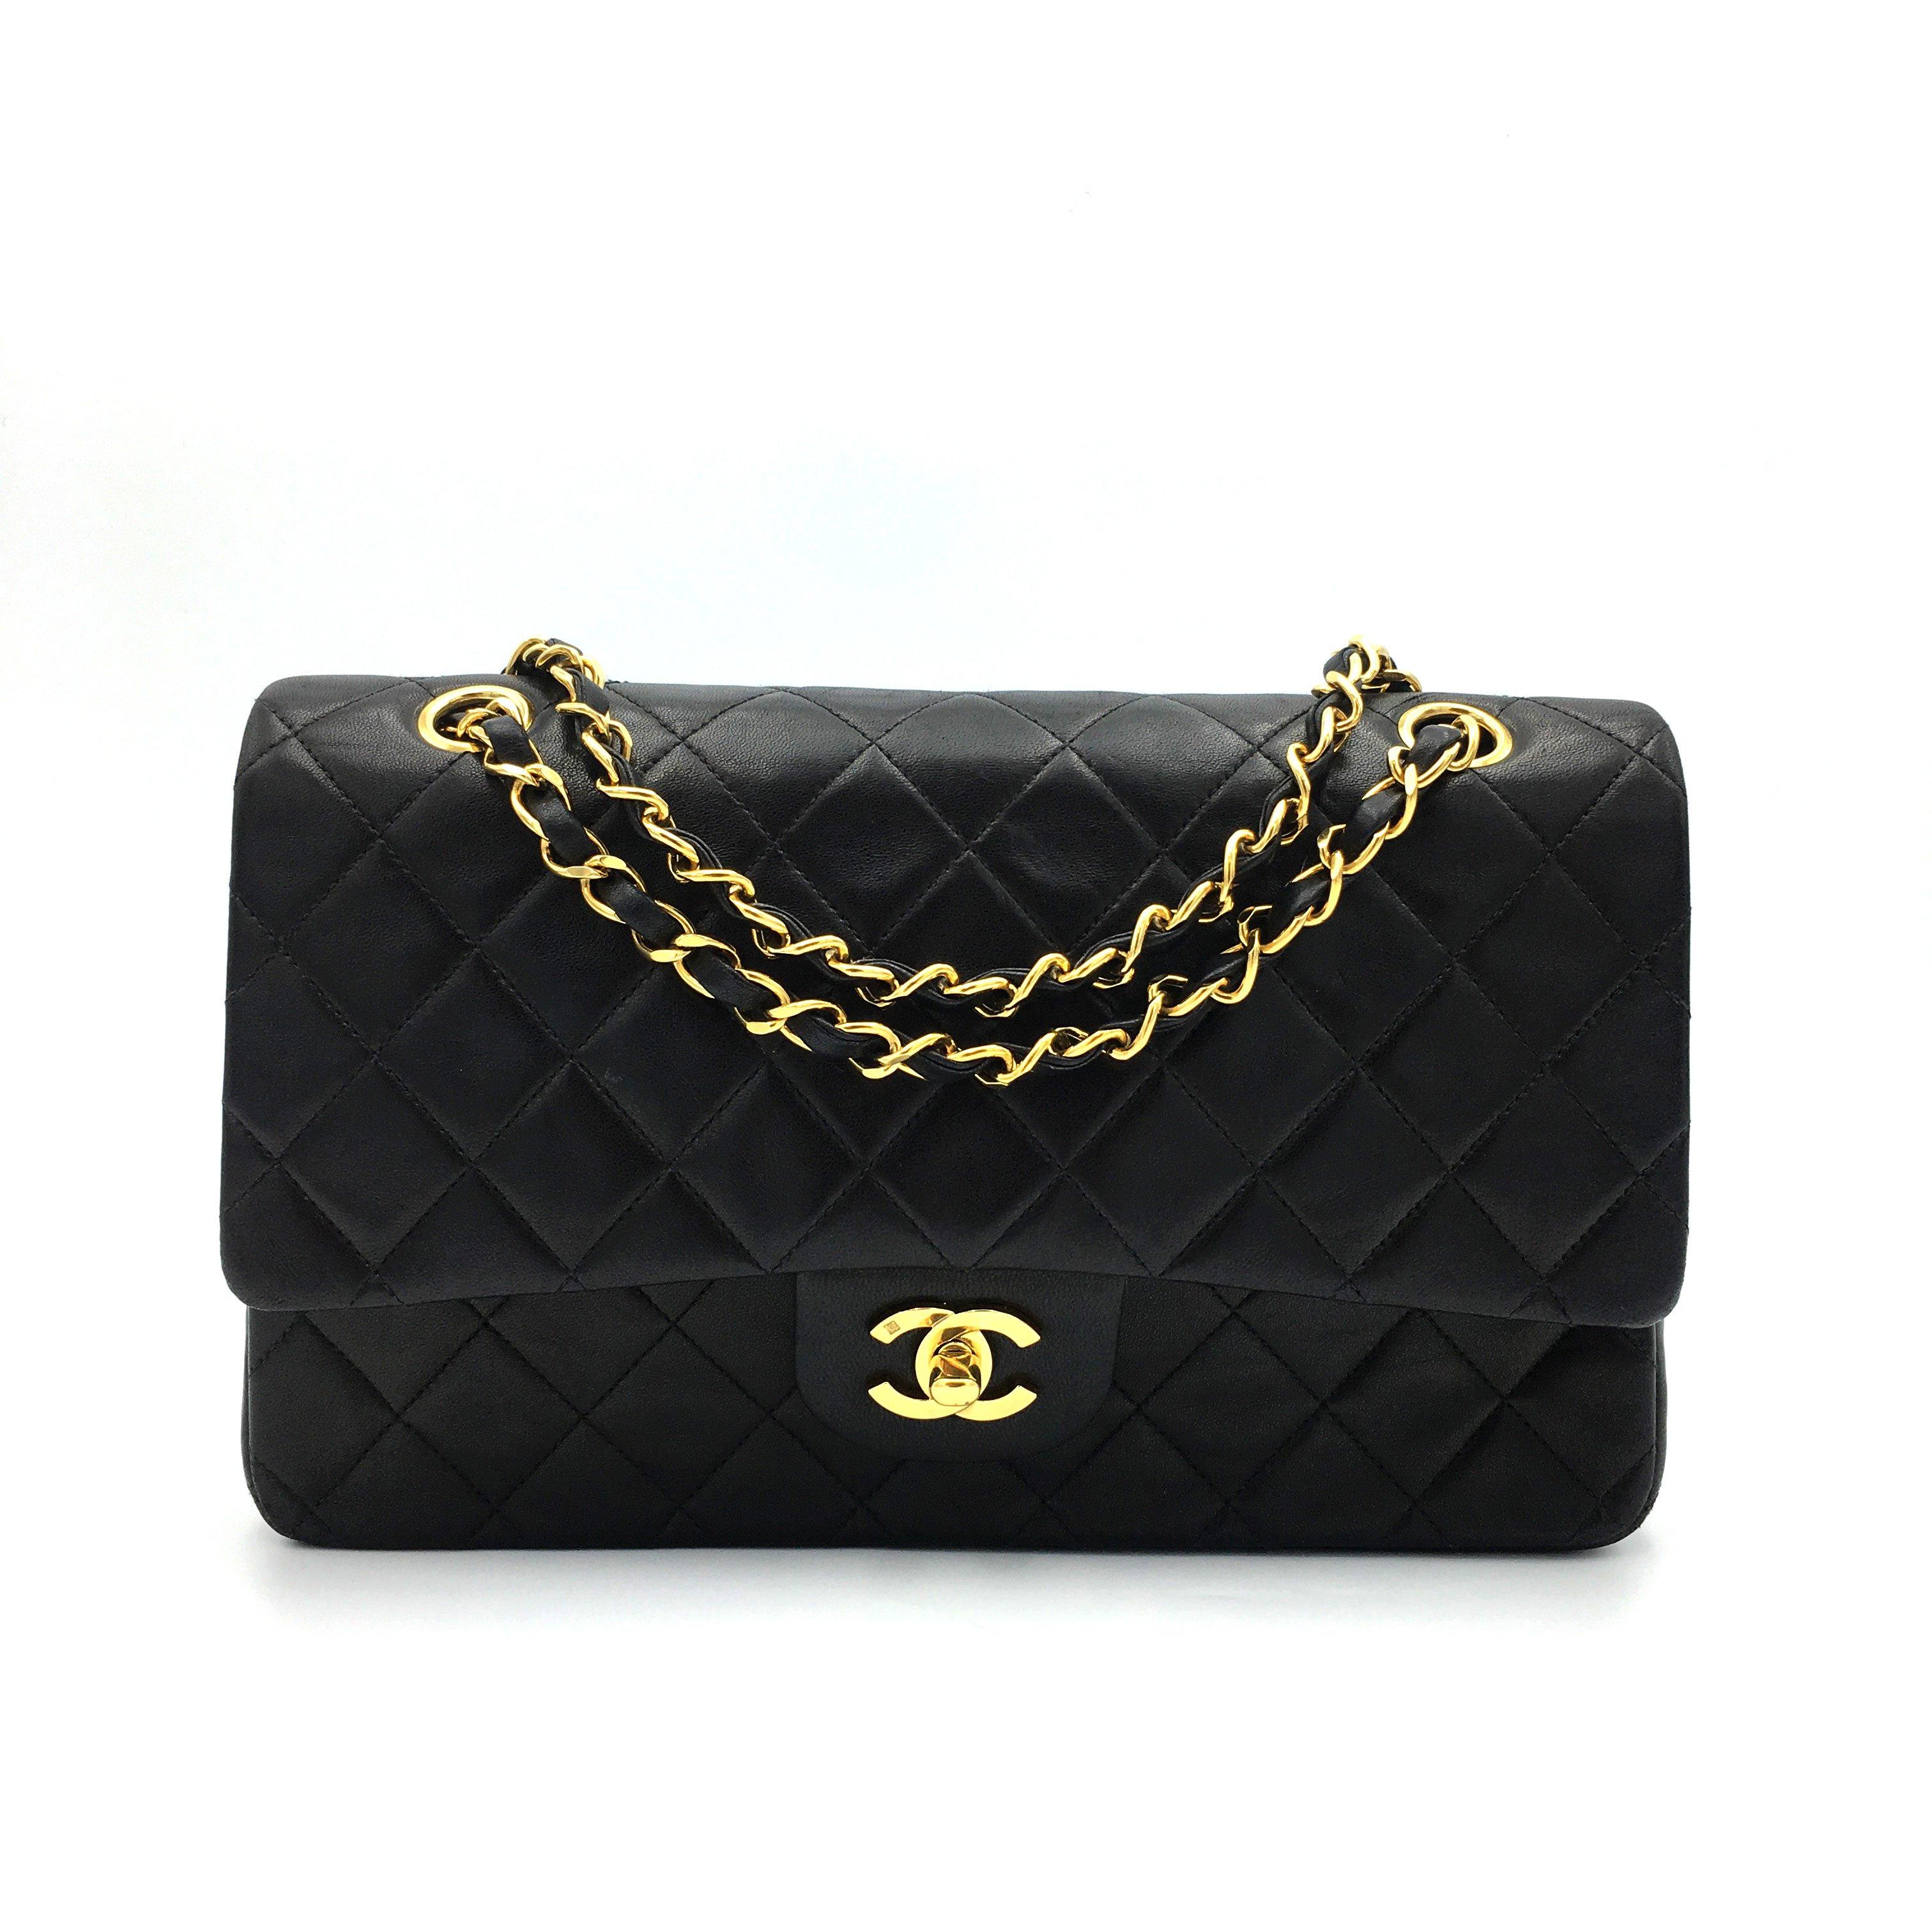 Borse Chanel Vintage Usate.Timeless Media Otto Vintage Borsa Chanel Vintage Timeless